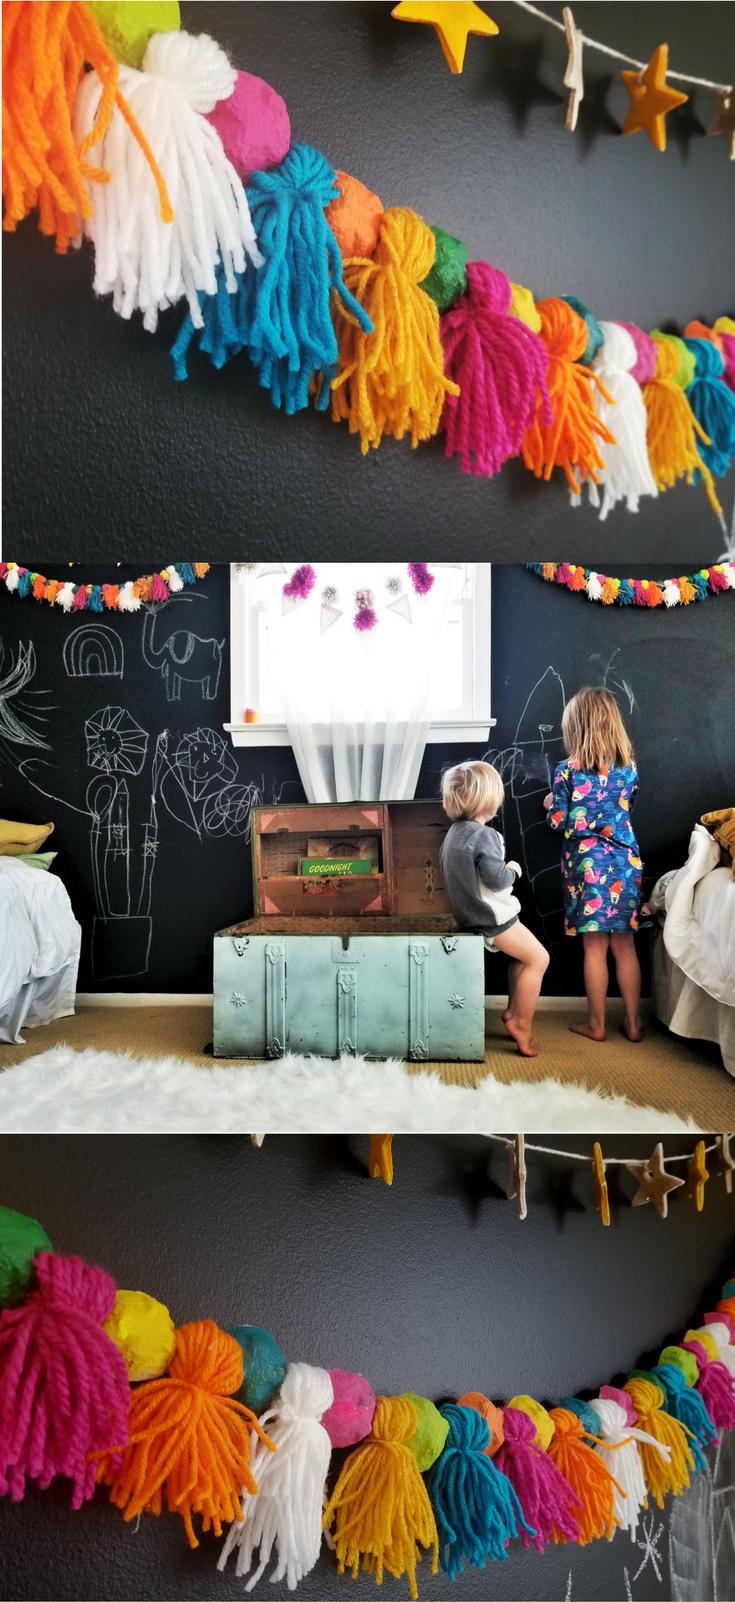 Shelves For Decor Ideas #decor Ideas 5 Minute Crafts #ideas Decor Entrance #dec...#crafts #dec #decor #entrance #ideas #minute #she… In 2020 | Diy Garland, Garland, Crafts